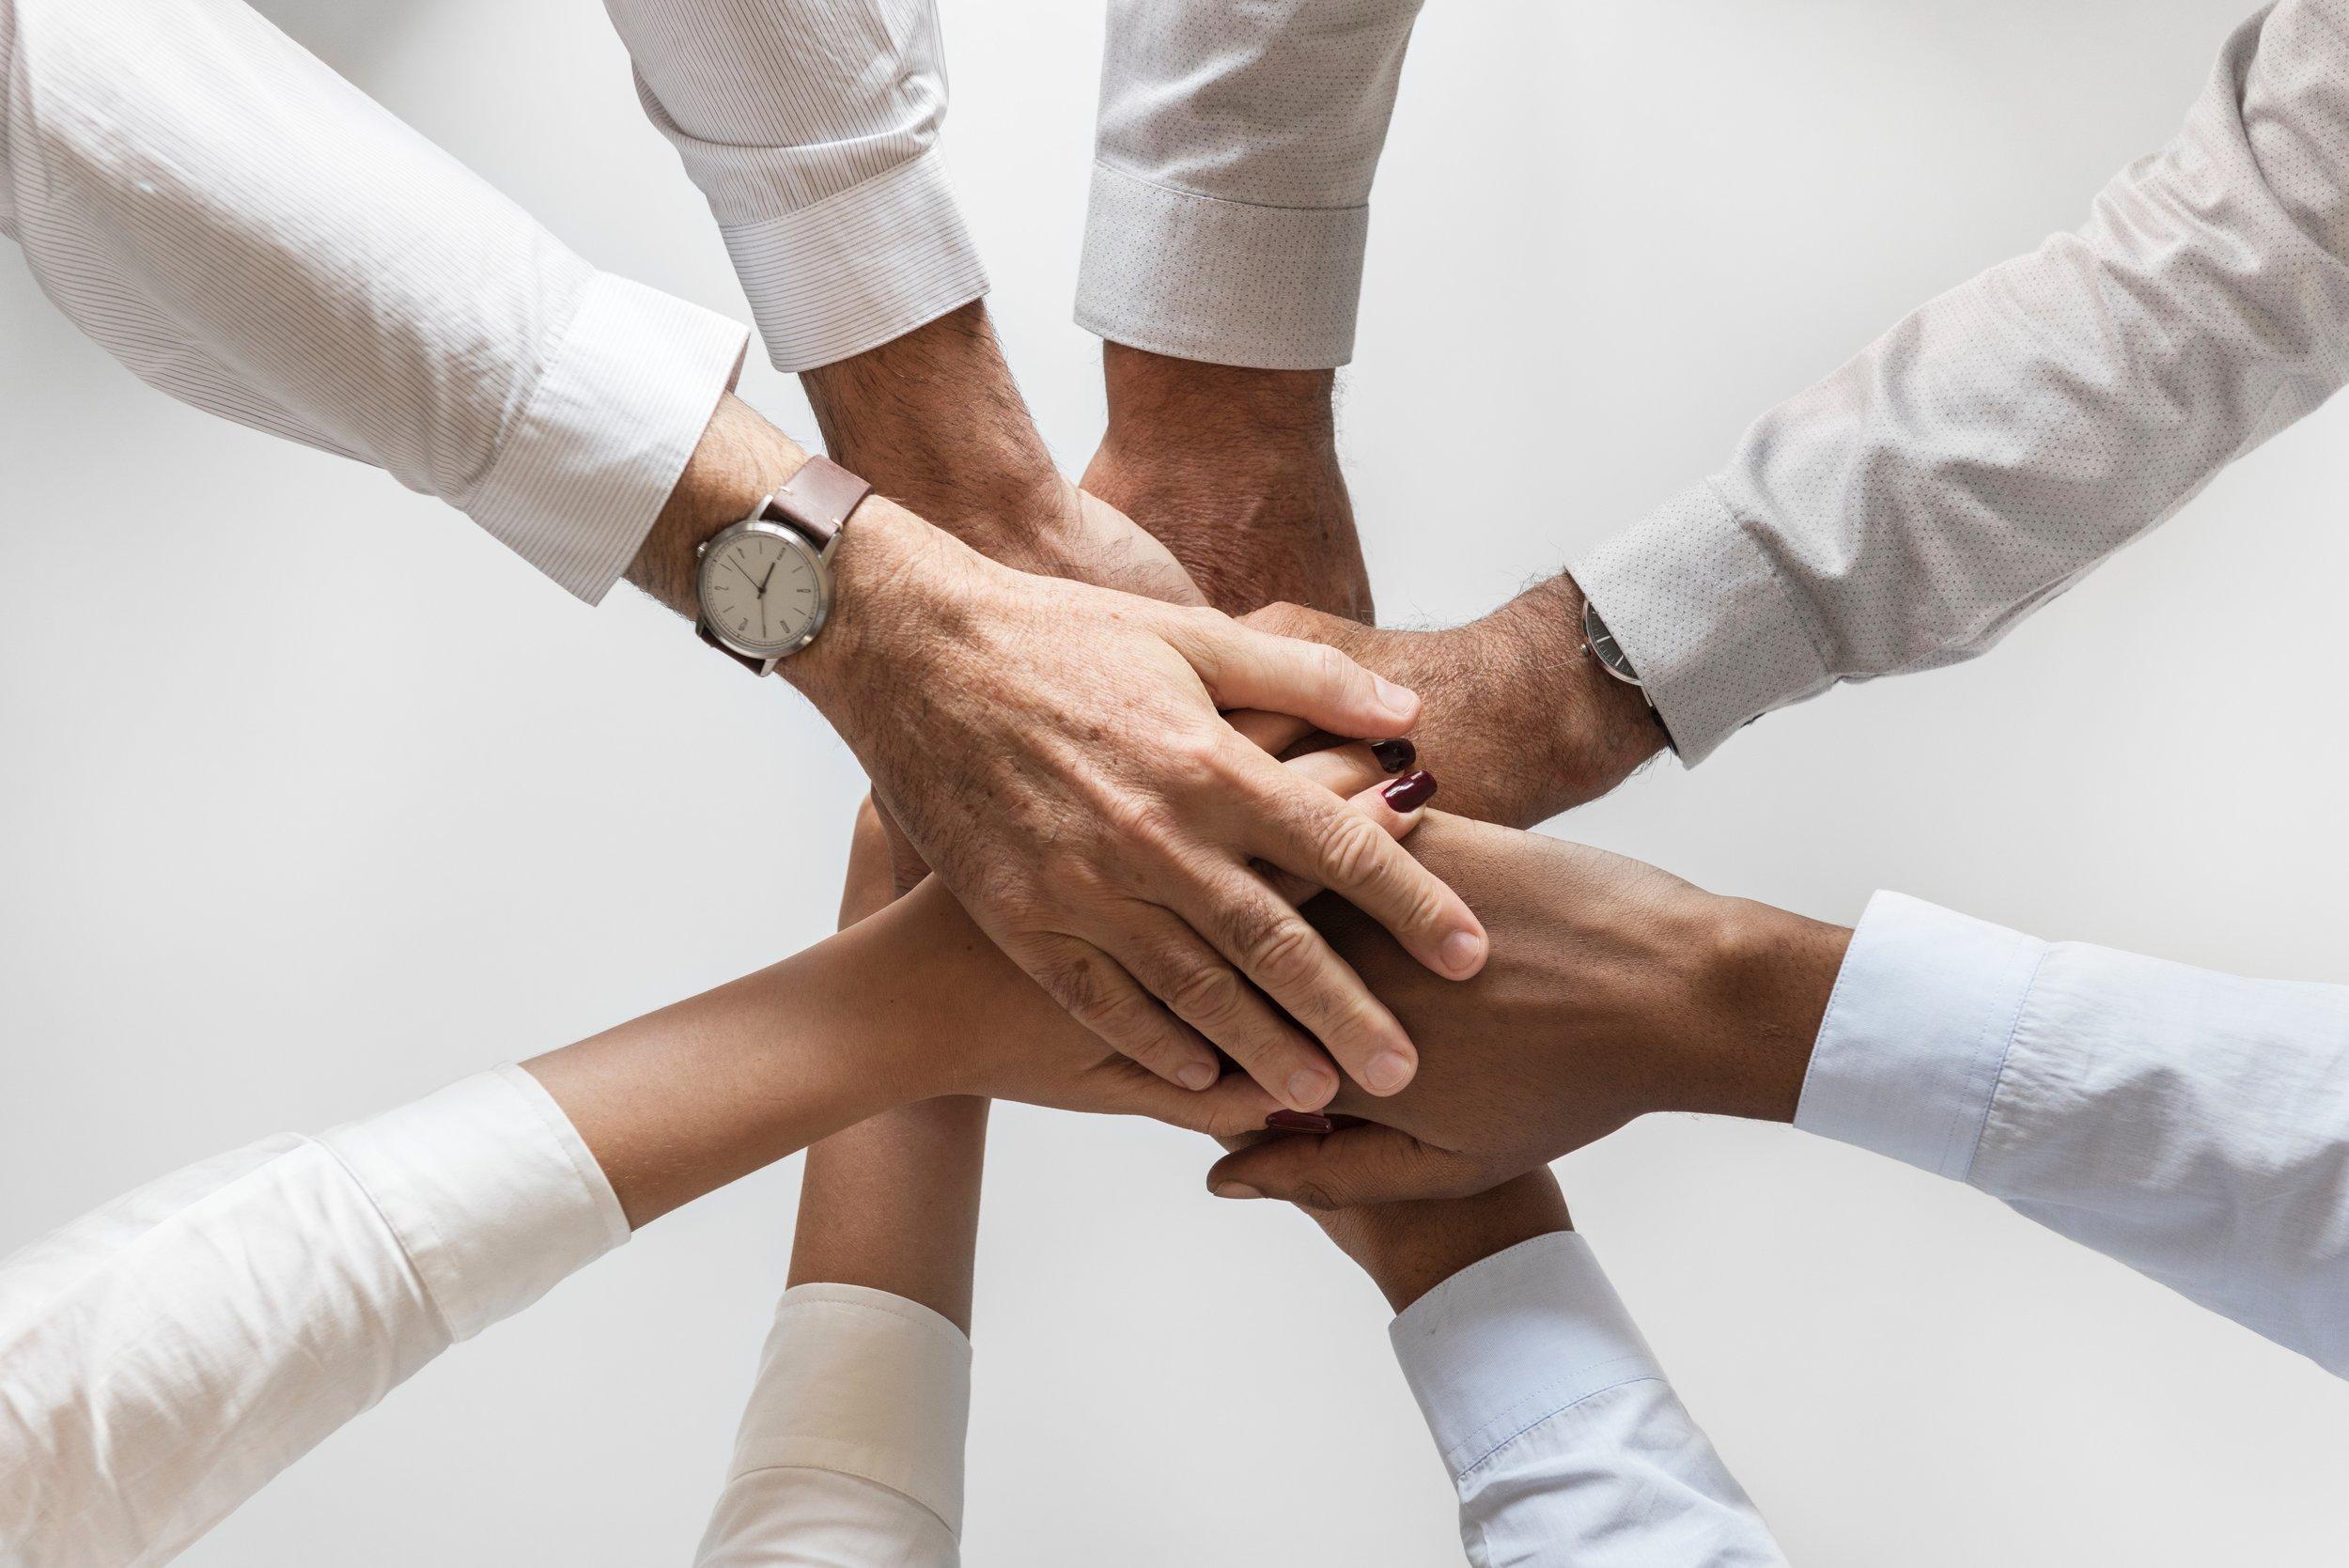 collaboration-community-cooperation-872955.jpg